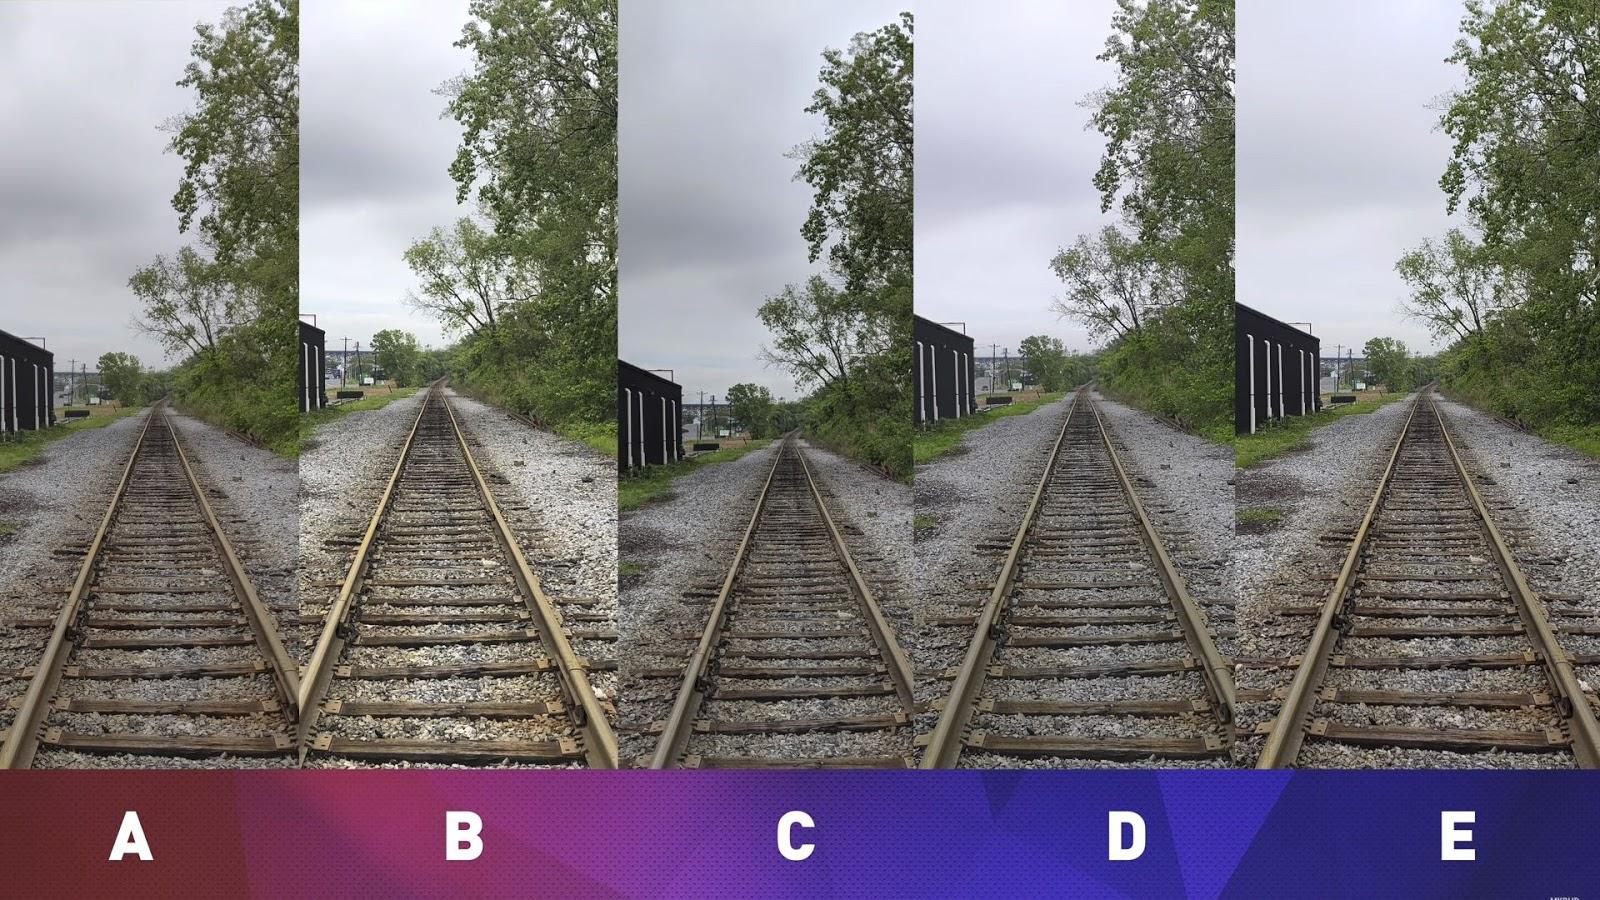 Сравнение детализации камер iPhone X, Huawei P20 Pro, OnePlus 6, Google Pixel 2 XL и Samsung Galaxy S9+